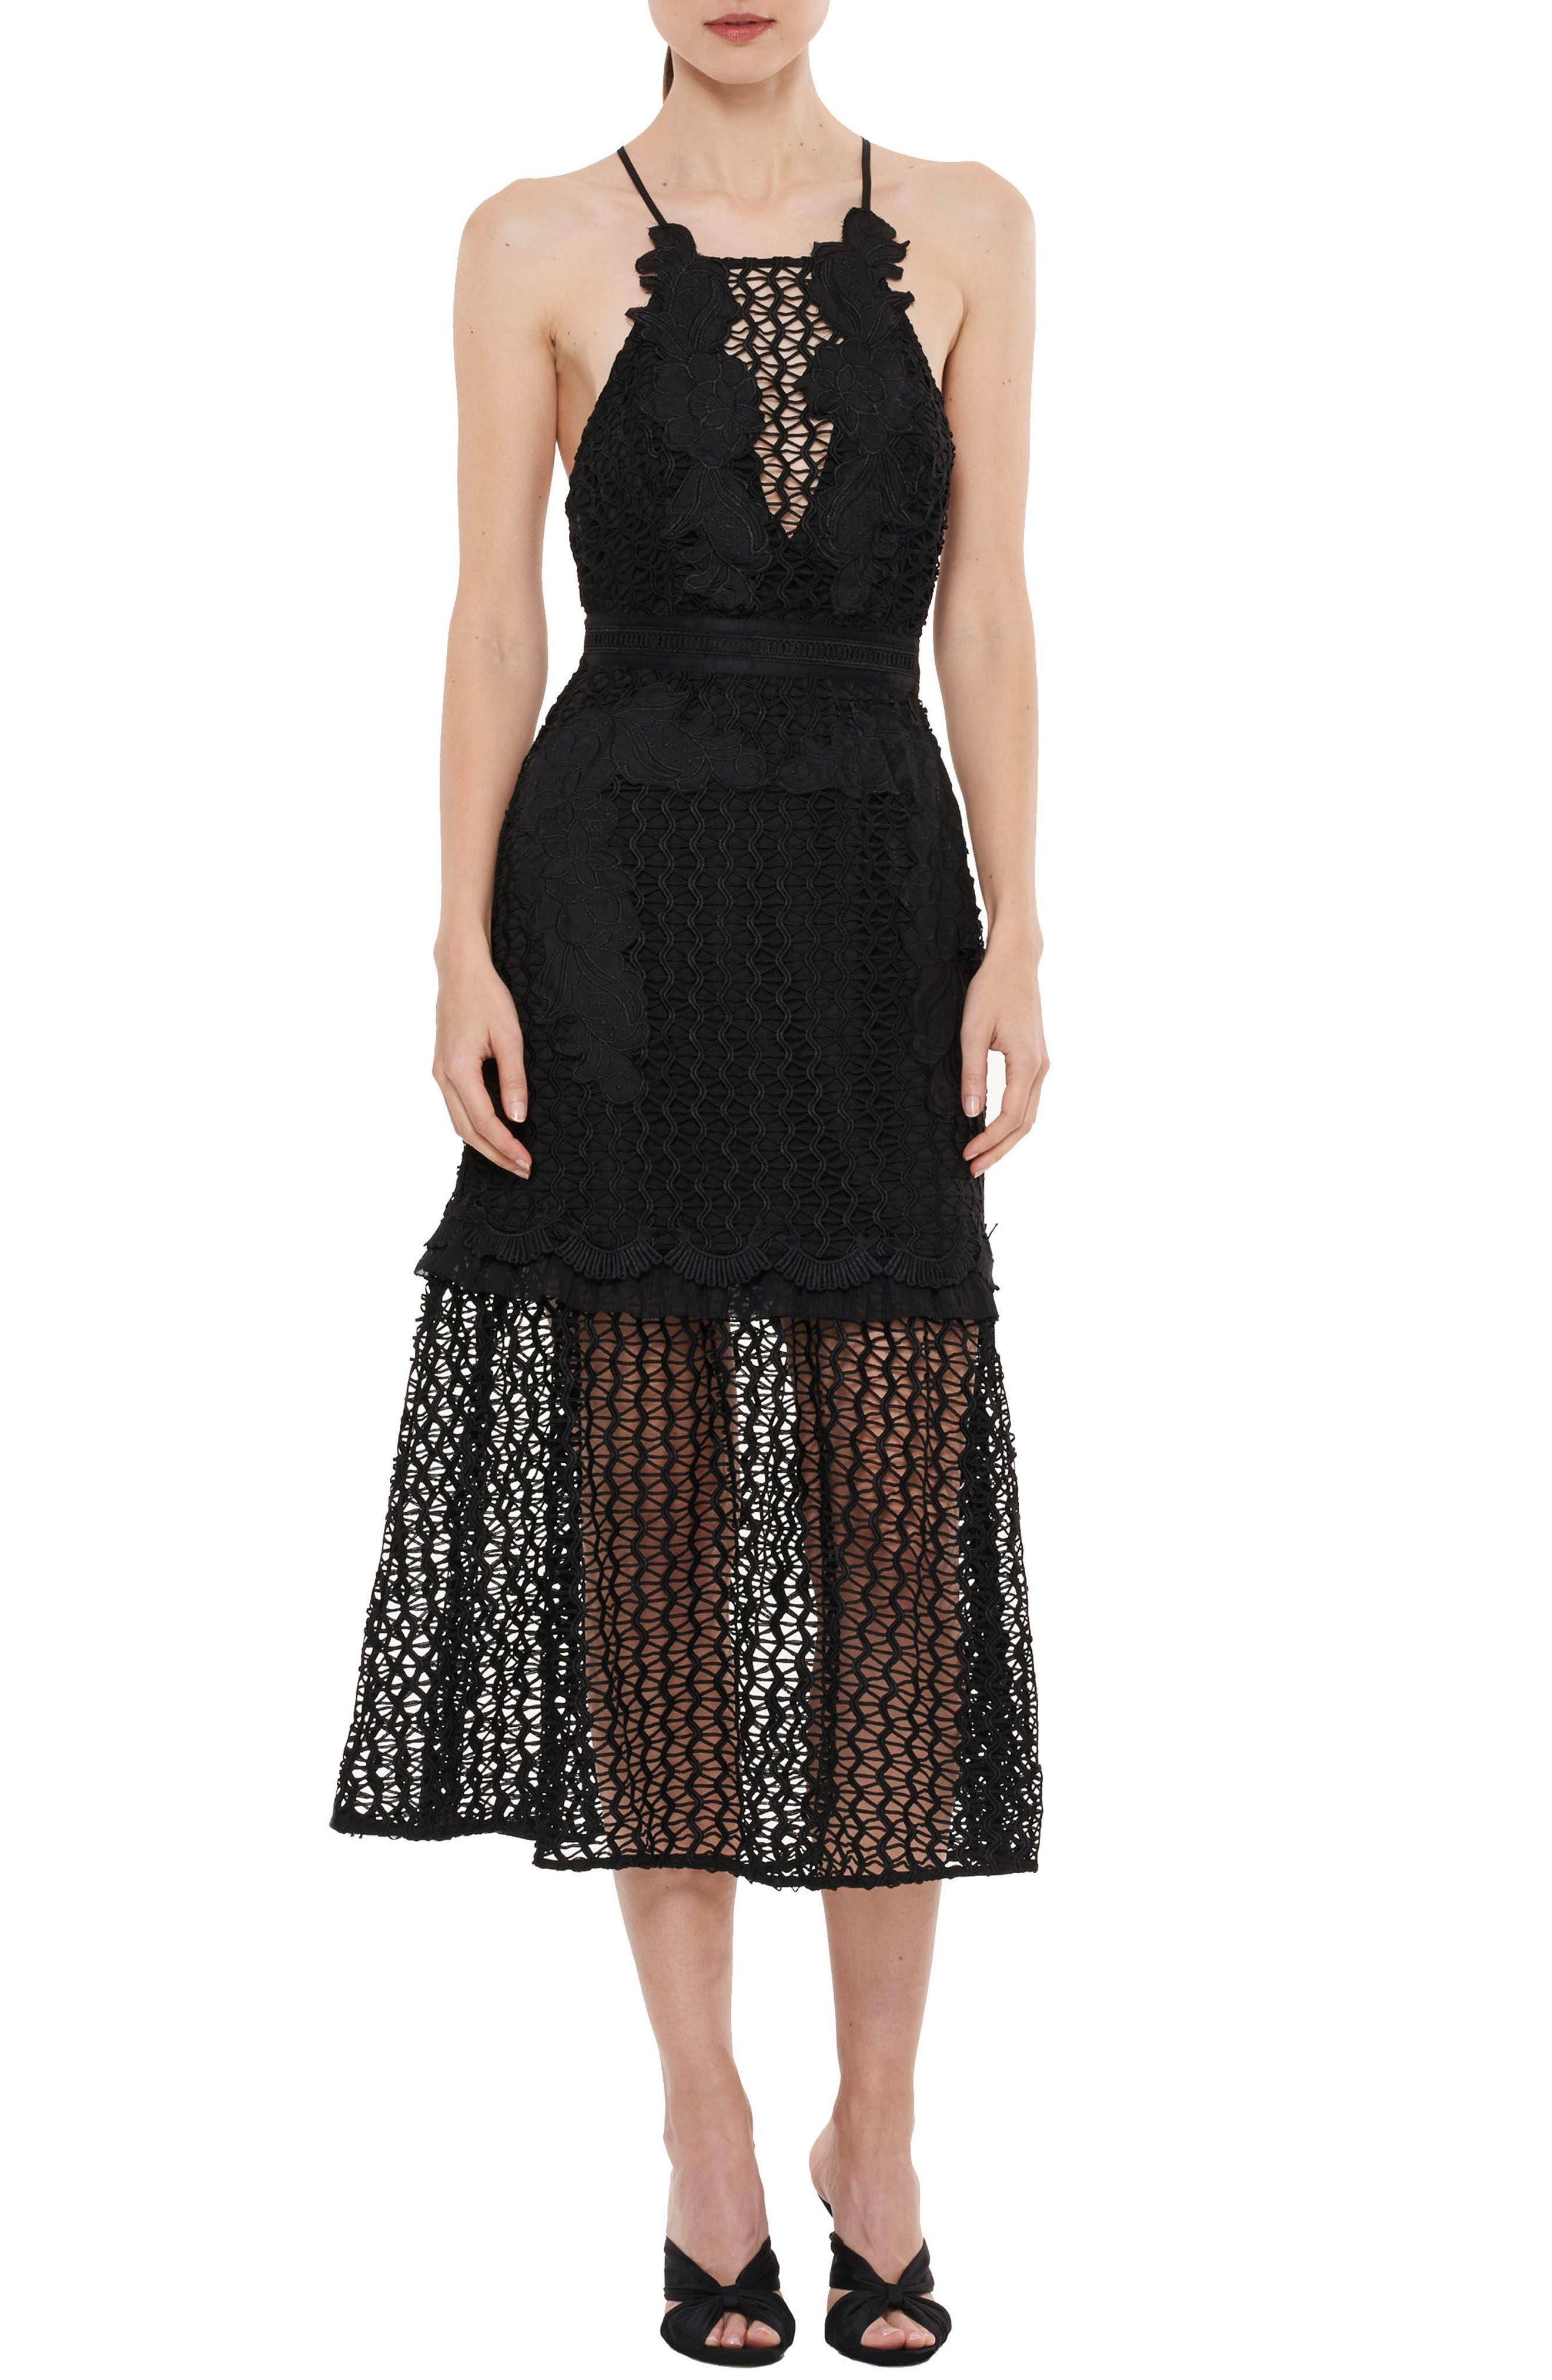 Sweet Dreams Crochet A-Line Dress,                             Main thumbnail 1, color,                             001